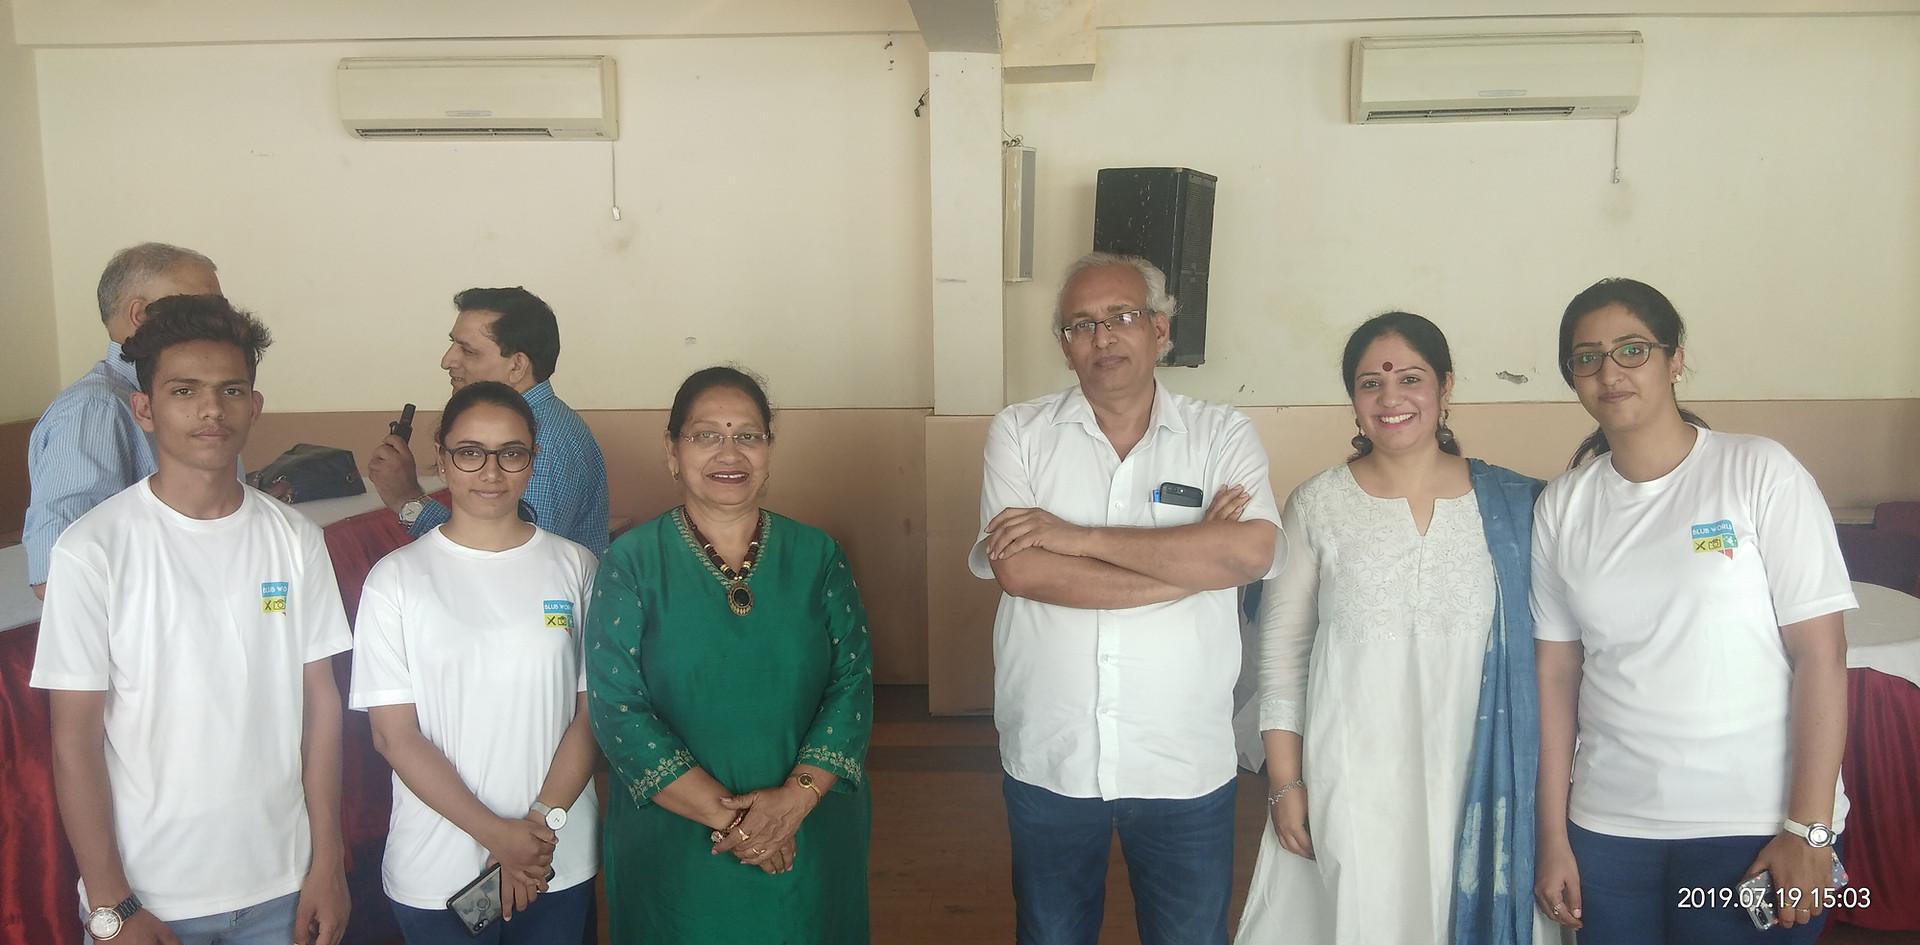 Mr. Tribhuvan Ji, Editor, Dainik Bhaskar, Rajasthan, with Mrs. Aditi Gaur, Founder, Mrs. Veena Gaur, Chairperson, Blub World and its team